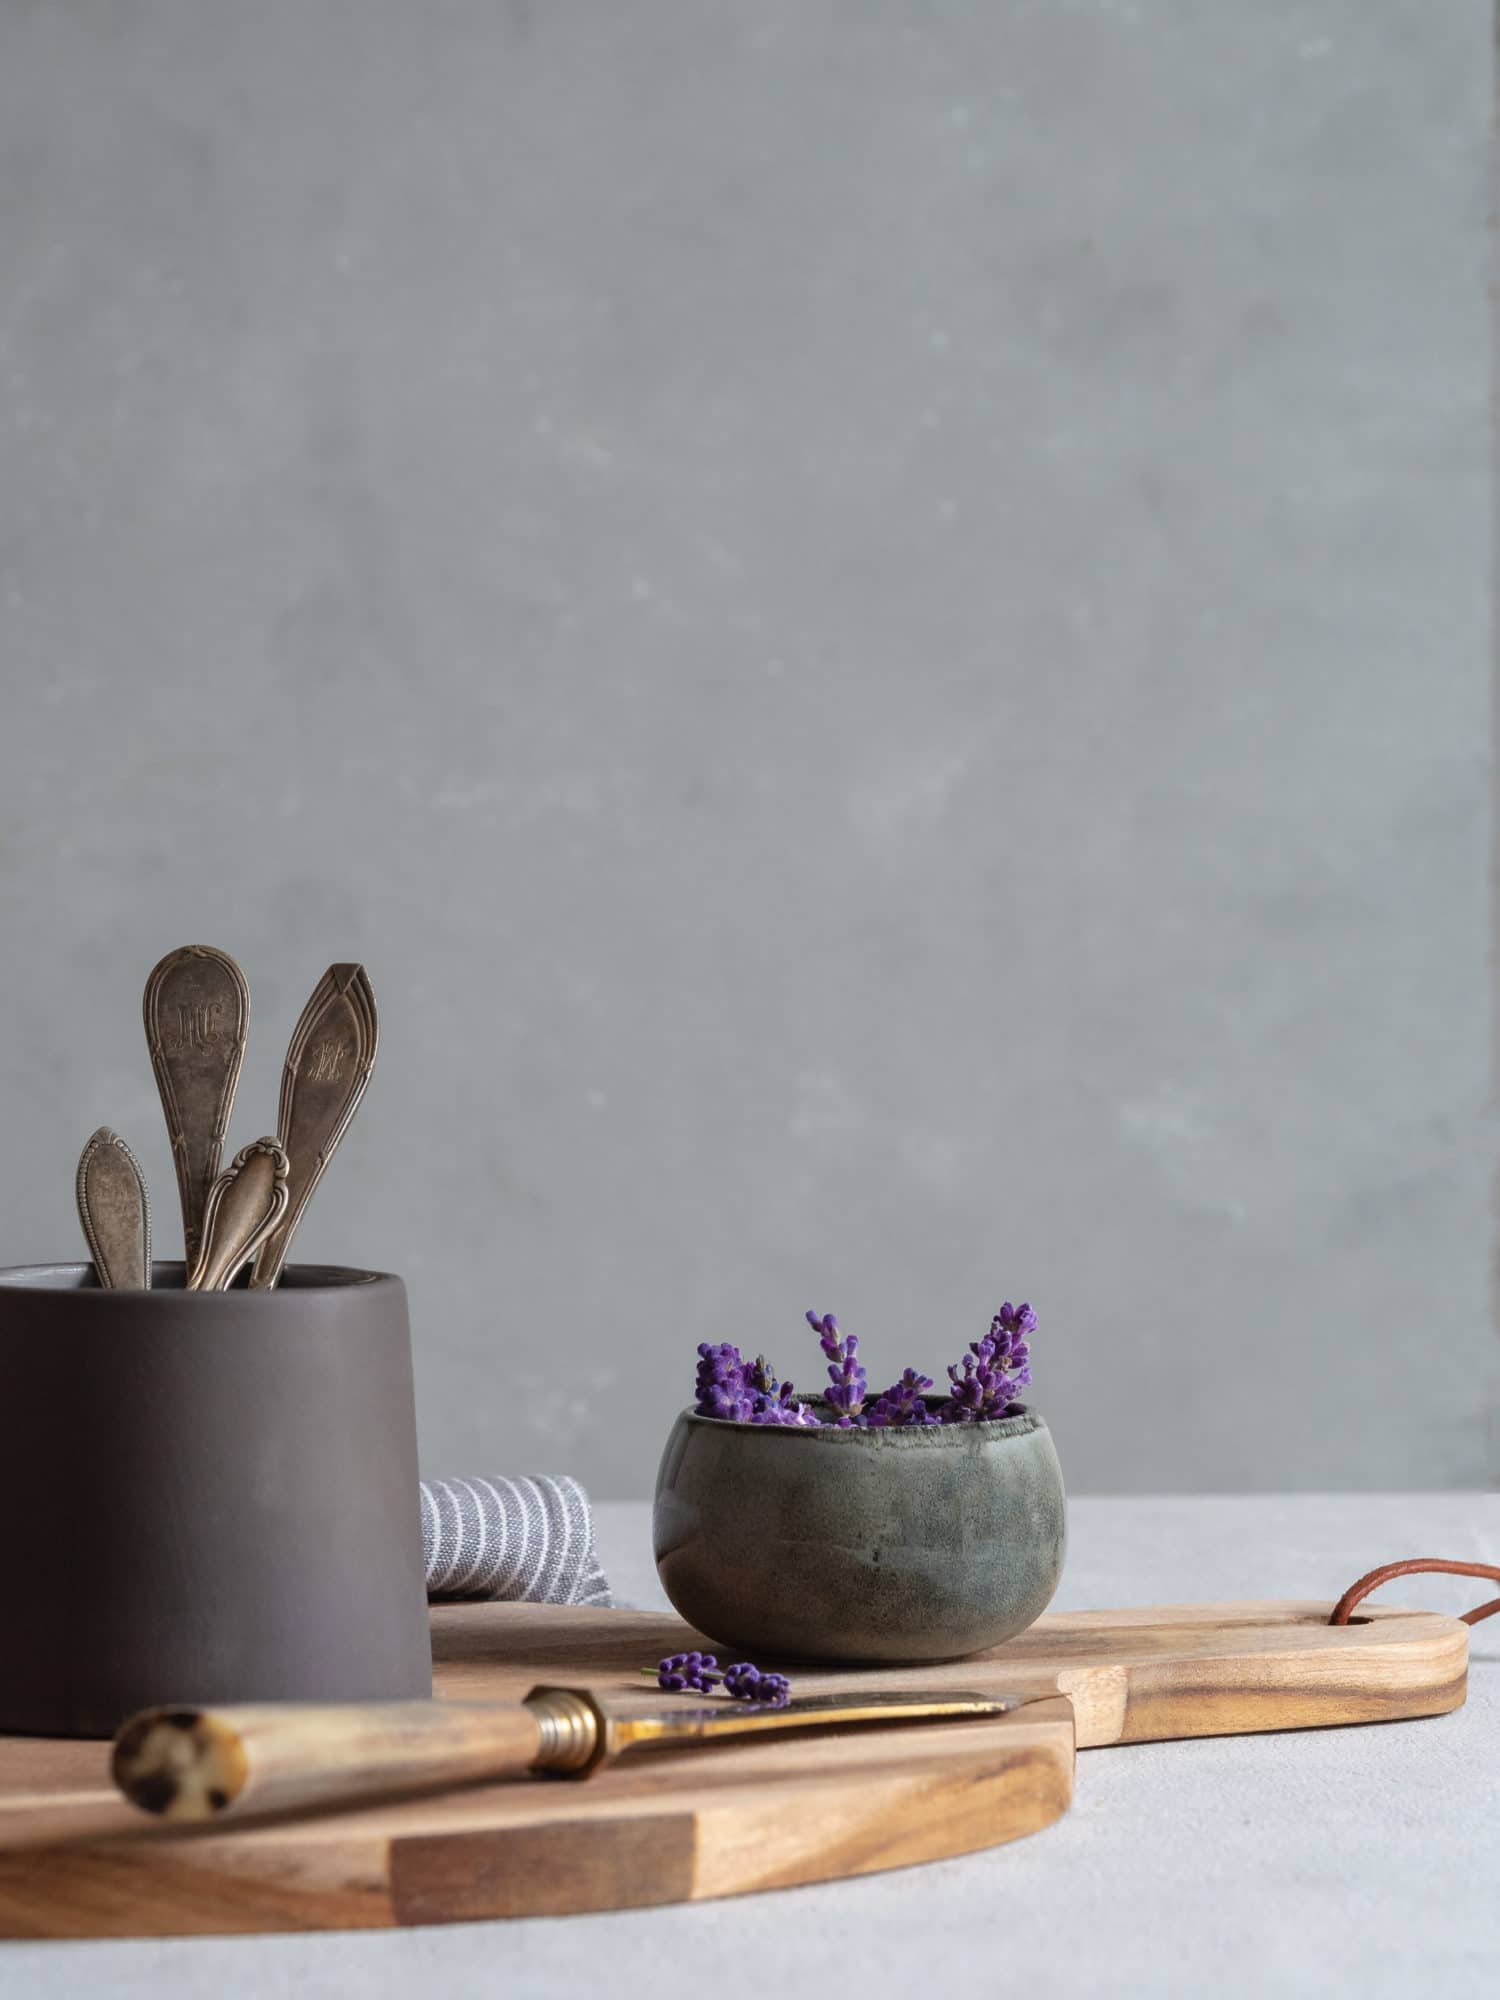 Lavendel und Besteck. Slow Living .